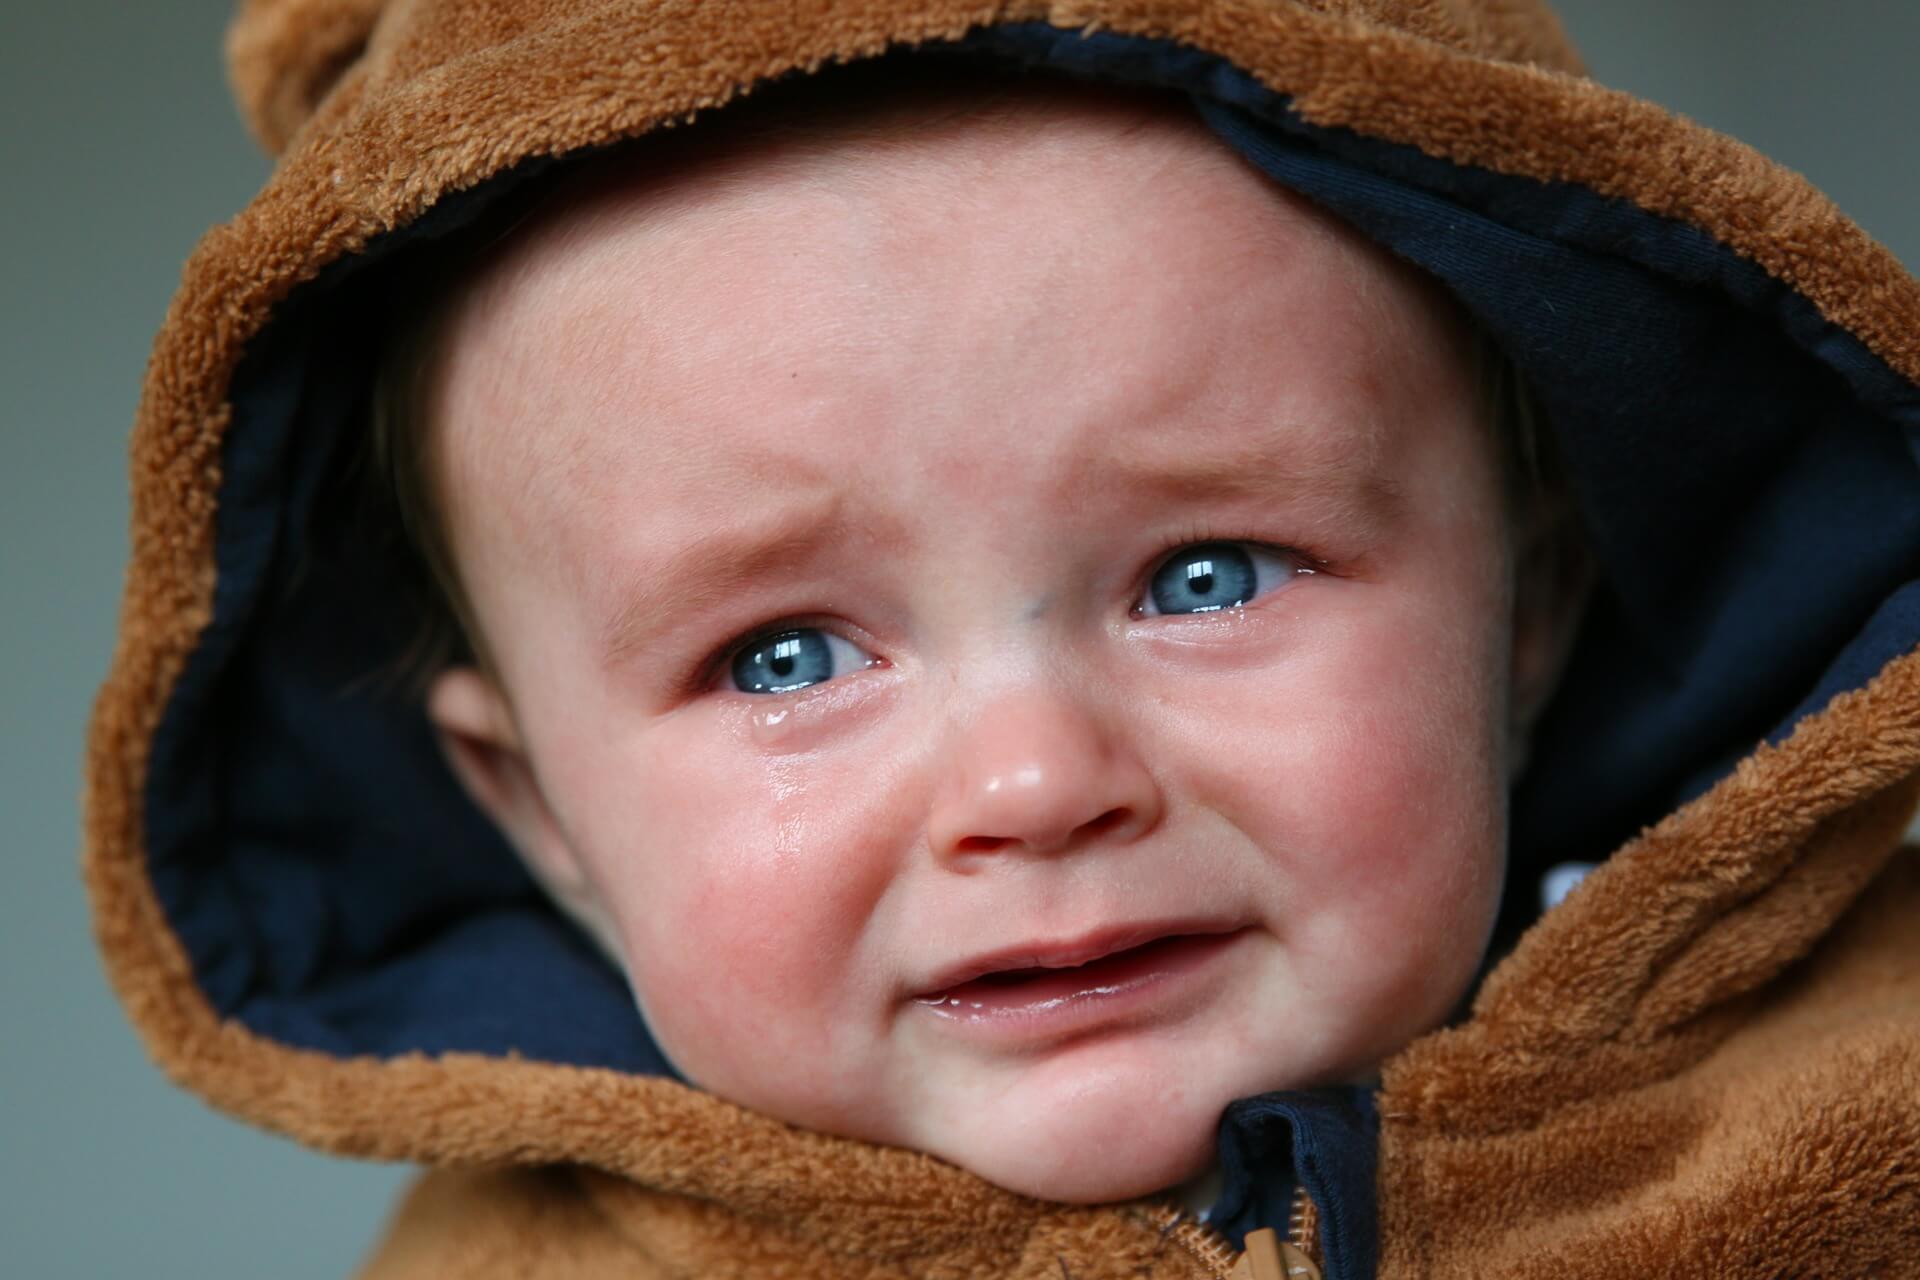 Kids Need Us during Temper Tantrums